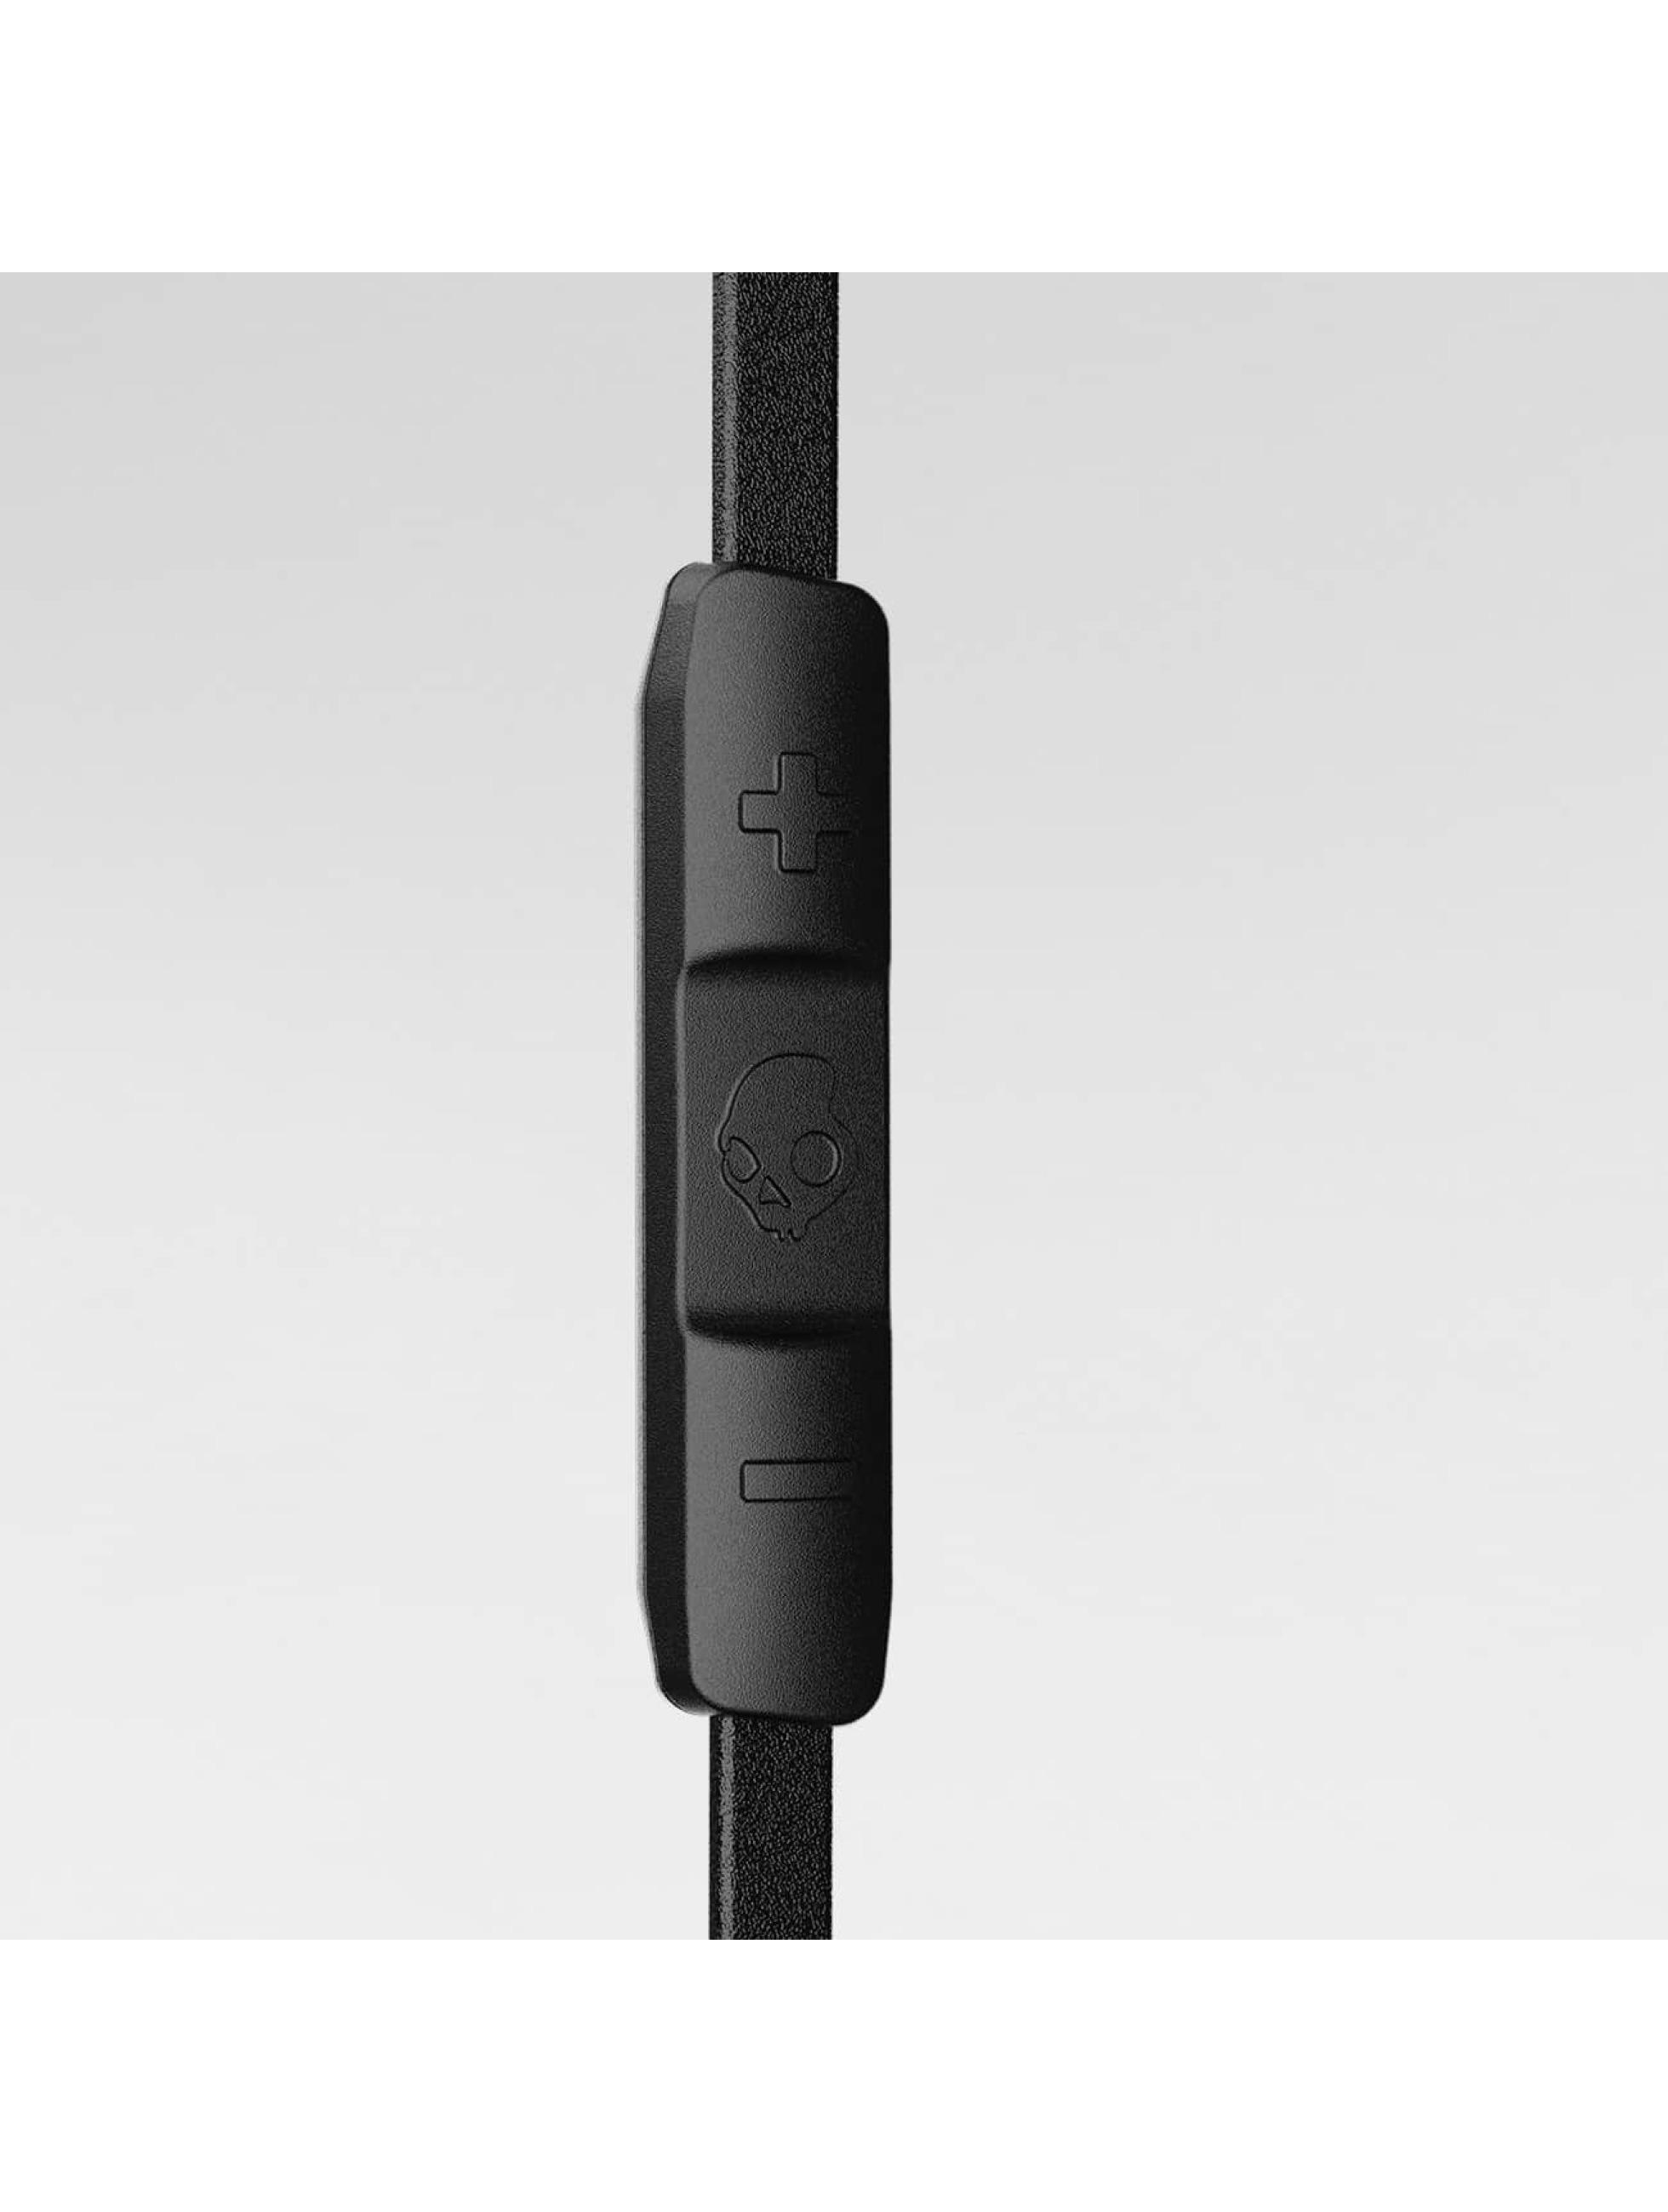 Skullcandy Koptelefoon Xtfree Wireless zwart